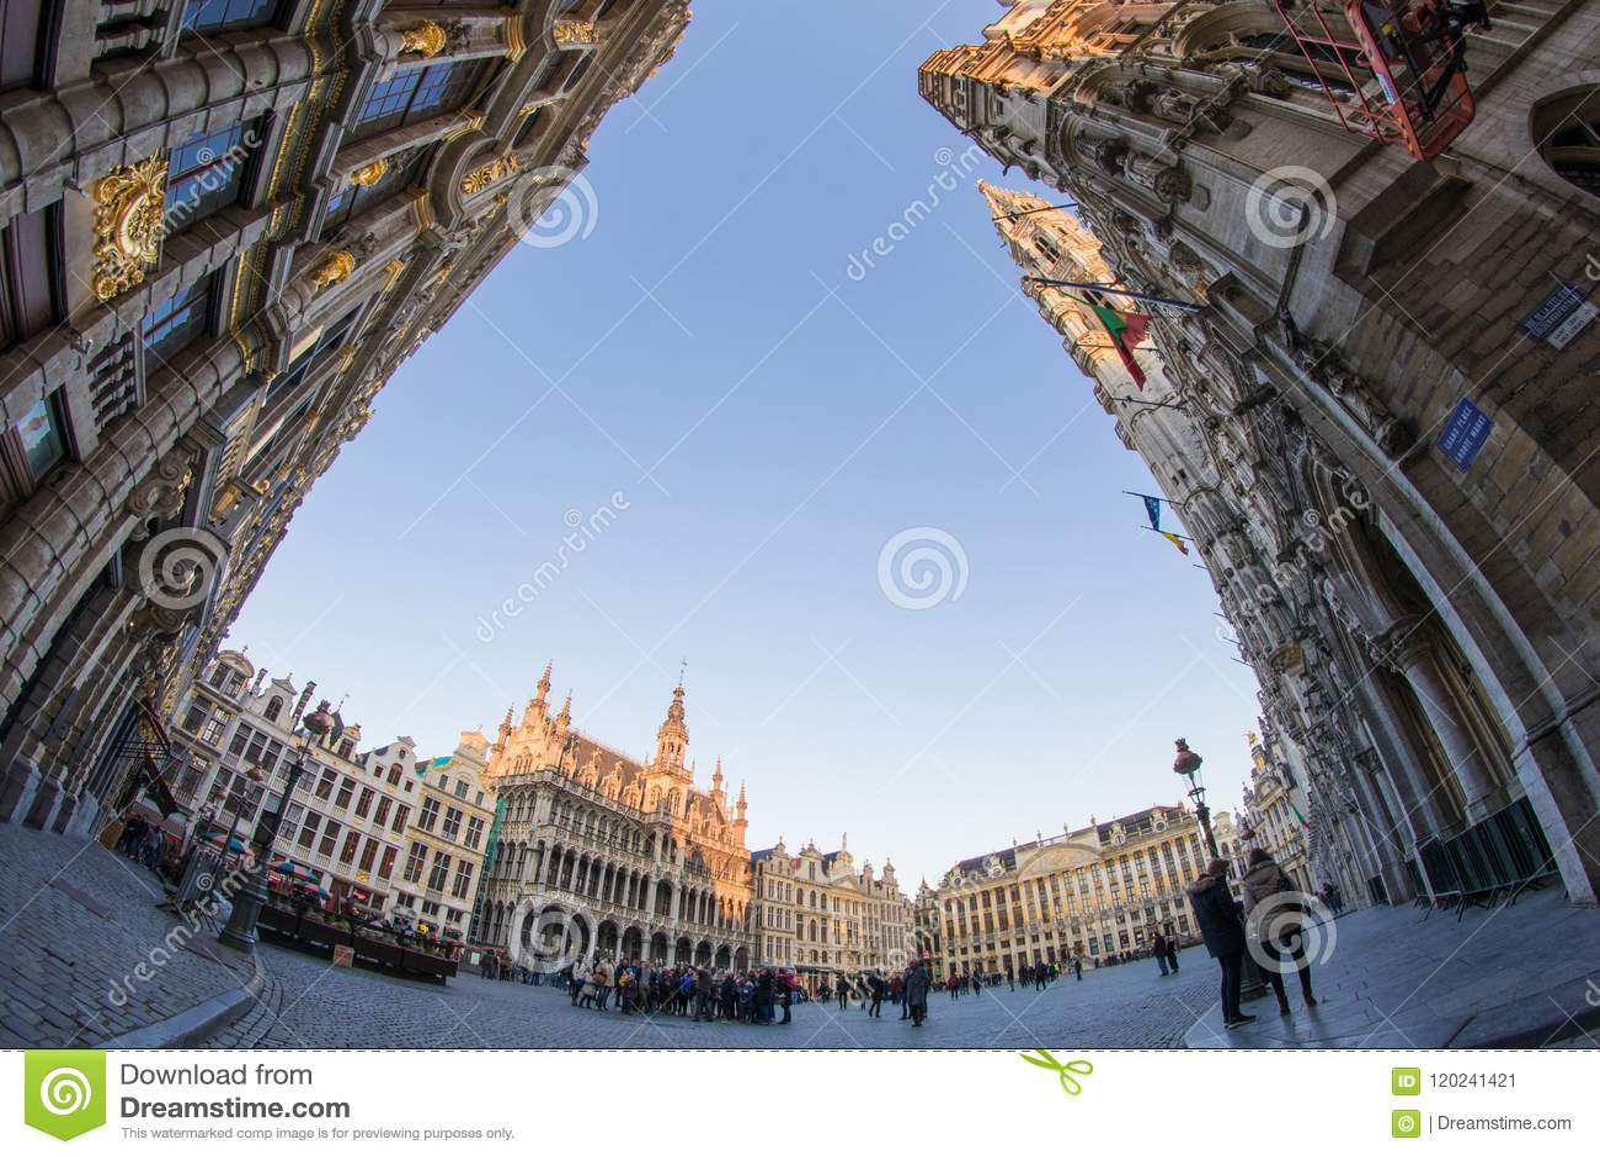 Grand-Place, Brussels, Belgium